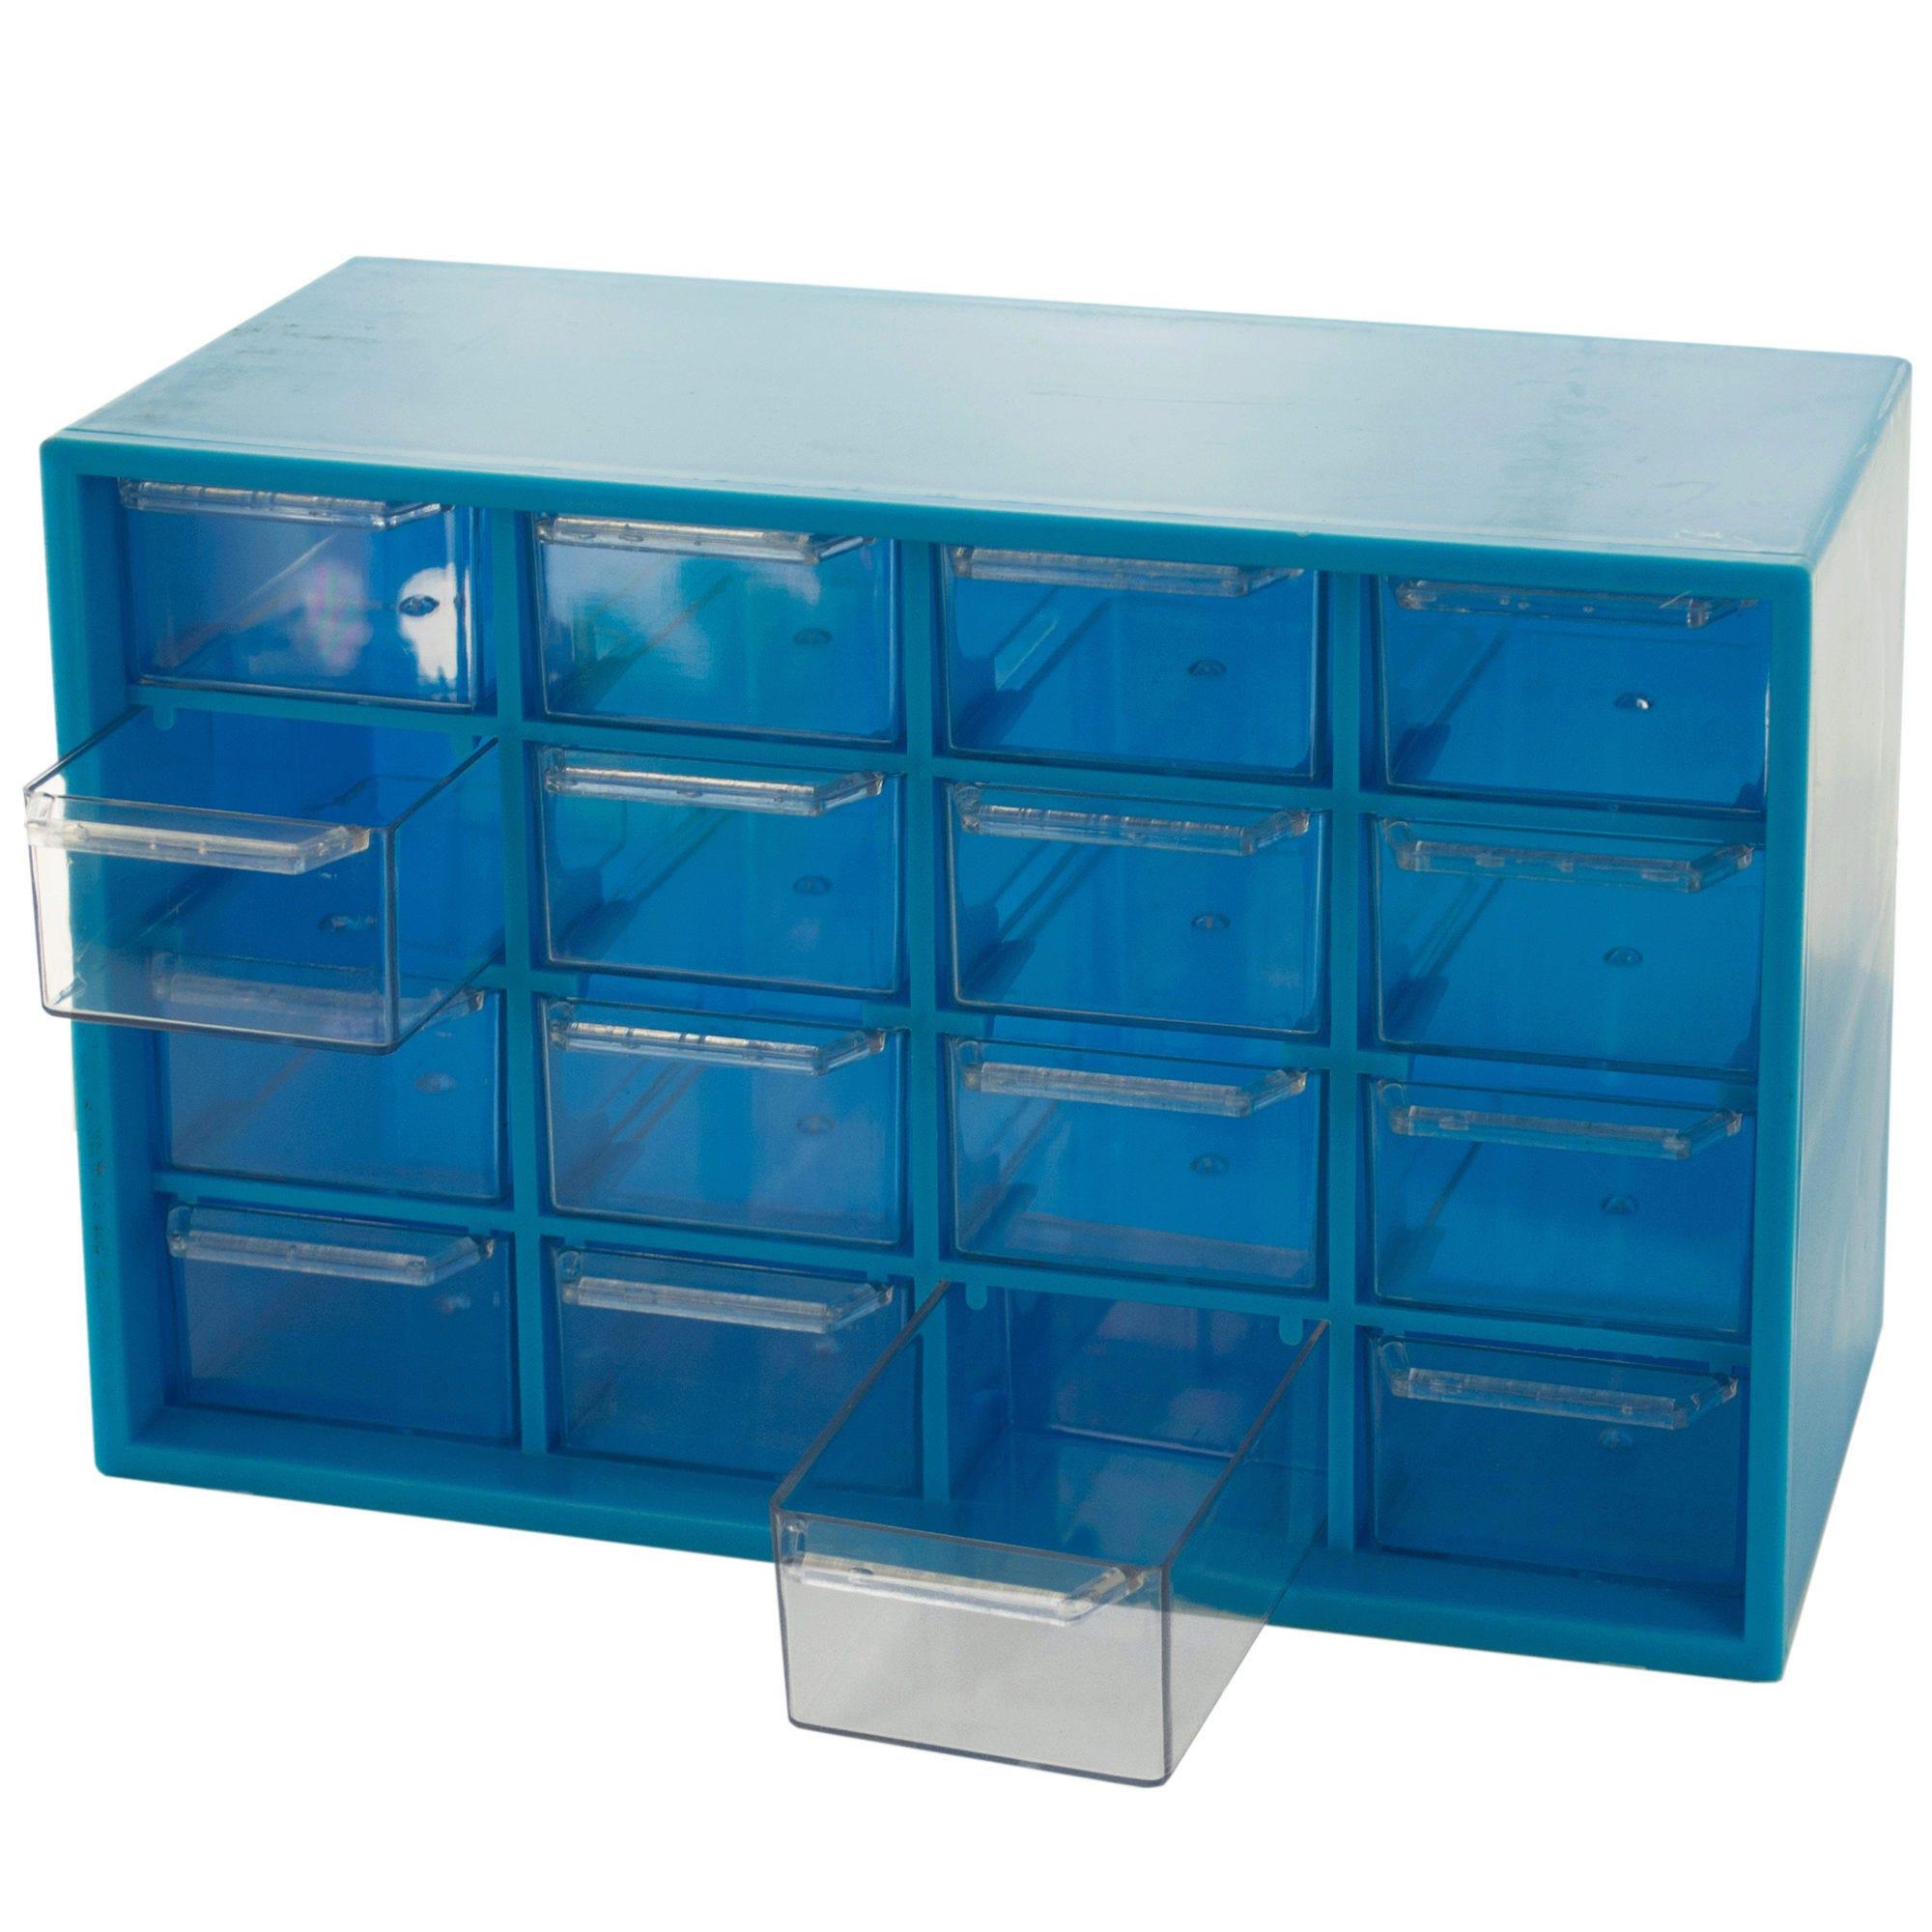 Multi-Purpose Hardware Storage Box with 16 Bins- Qty 4